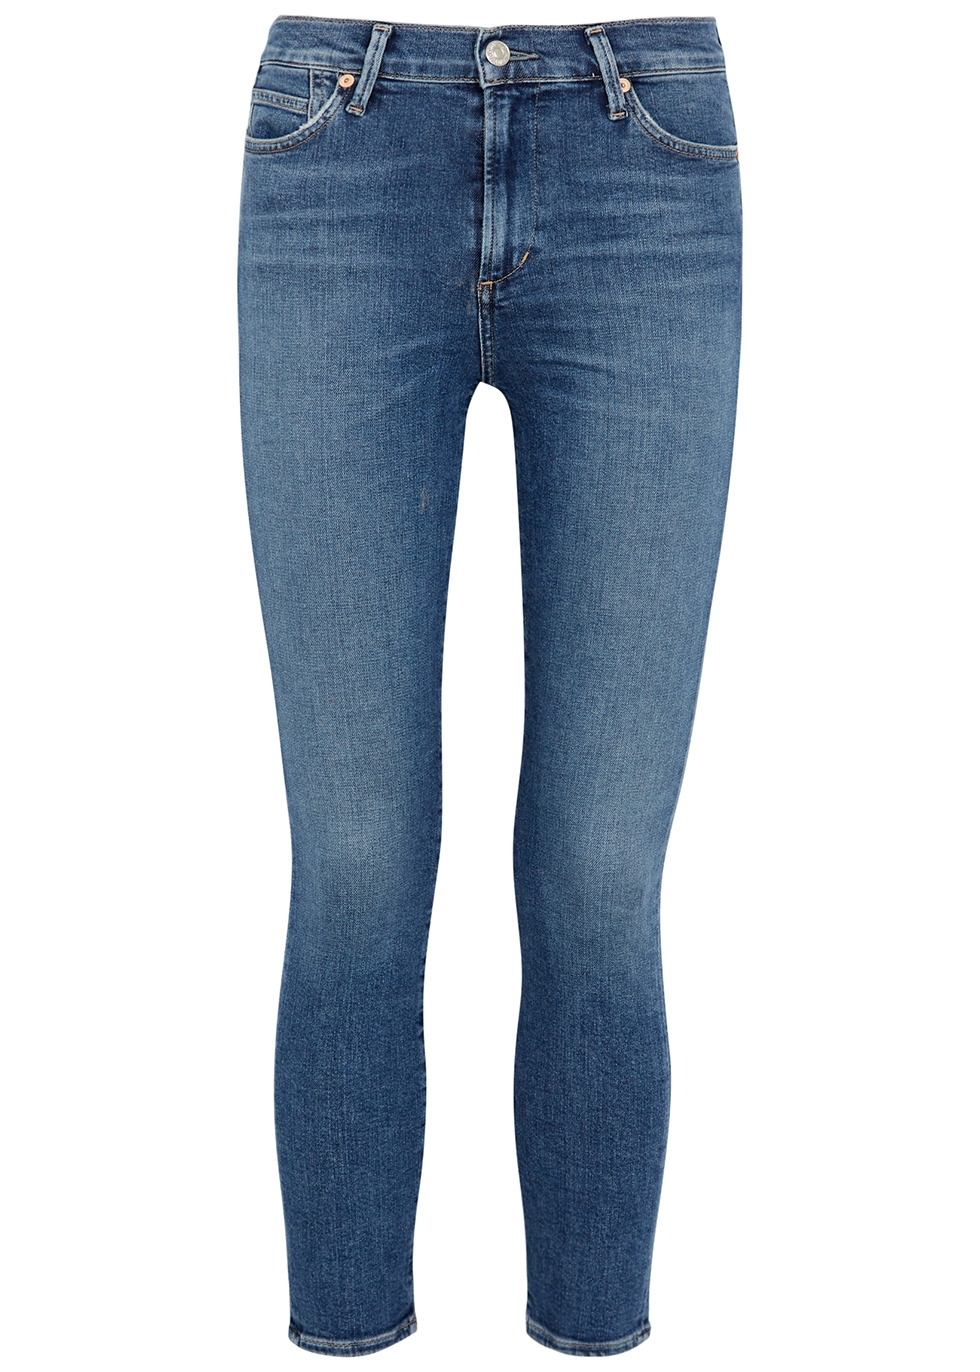 Rocket blue cropped skinny jeans